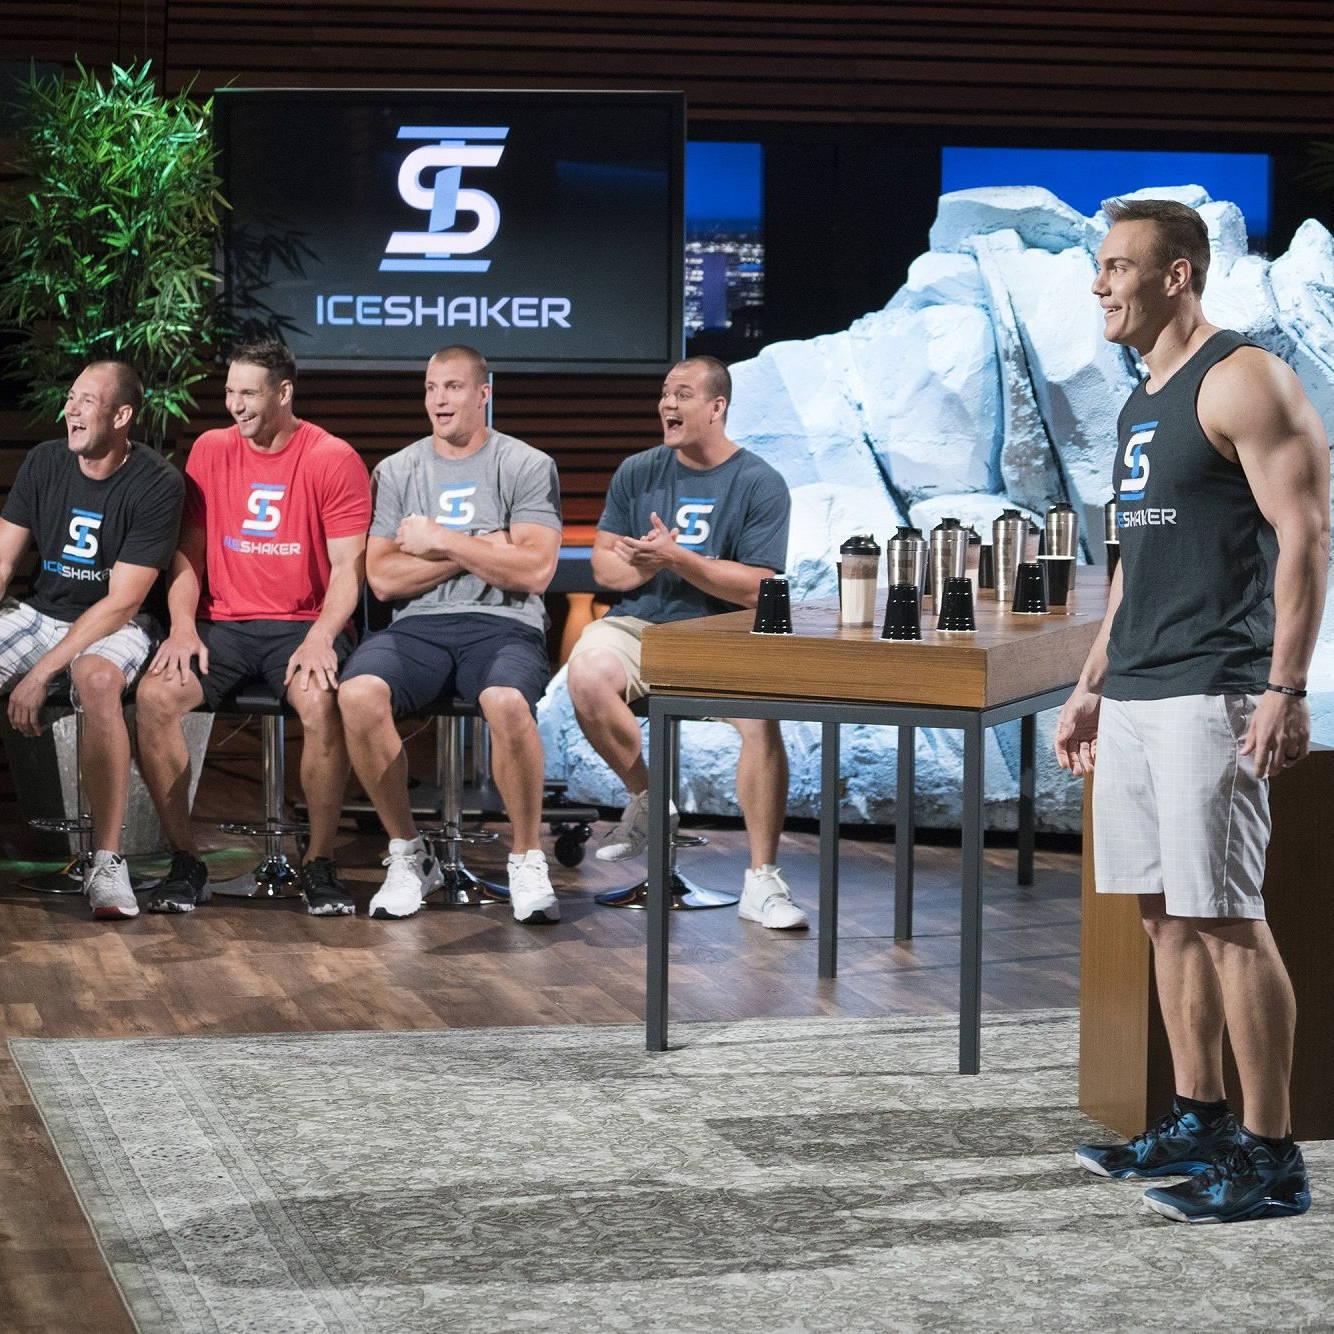 Ice Shaker Shark Tank Episode